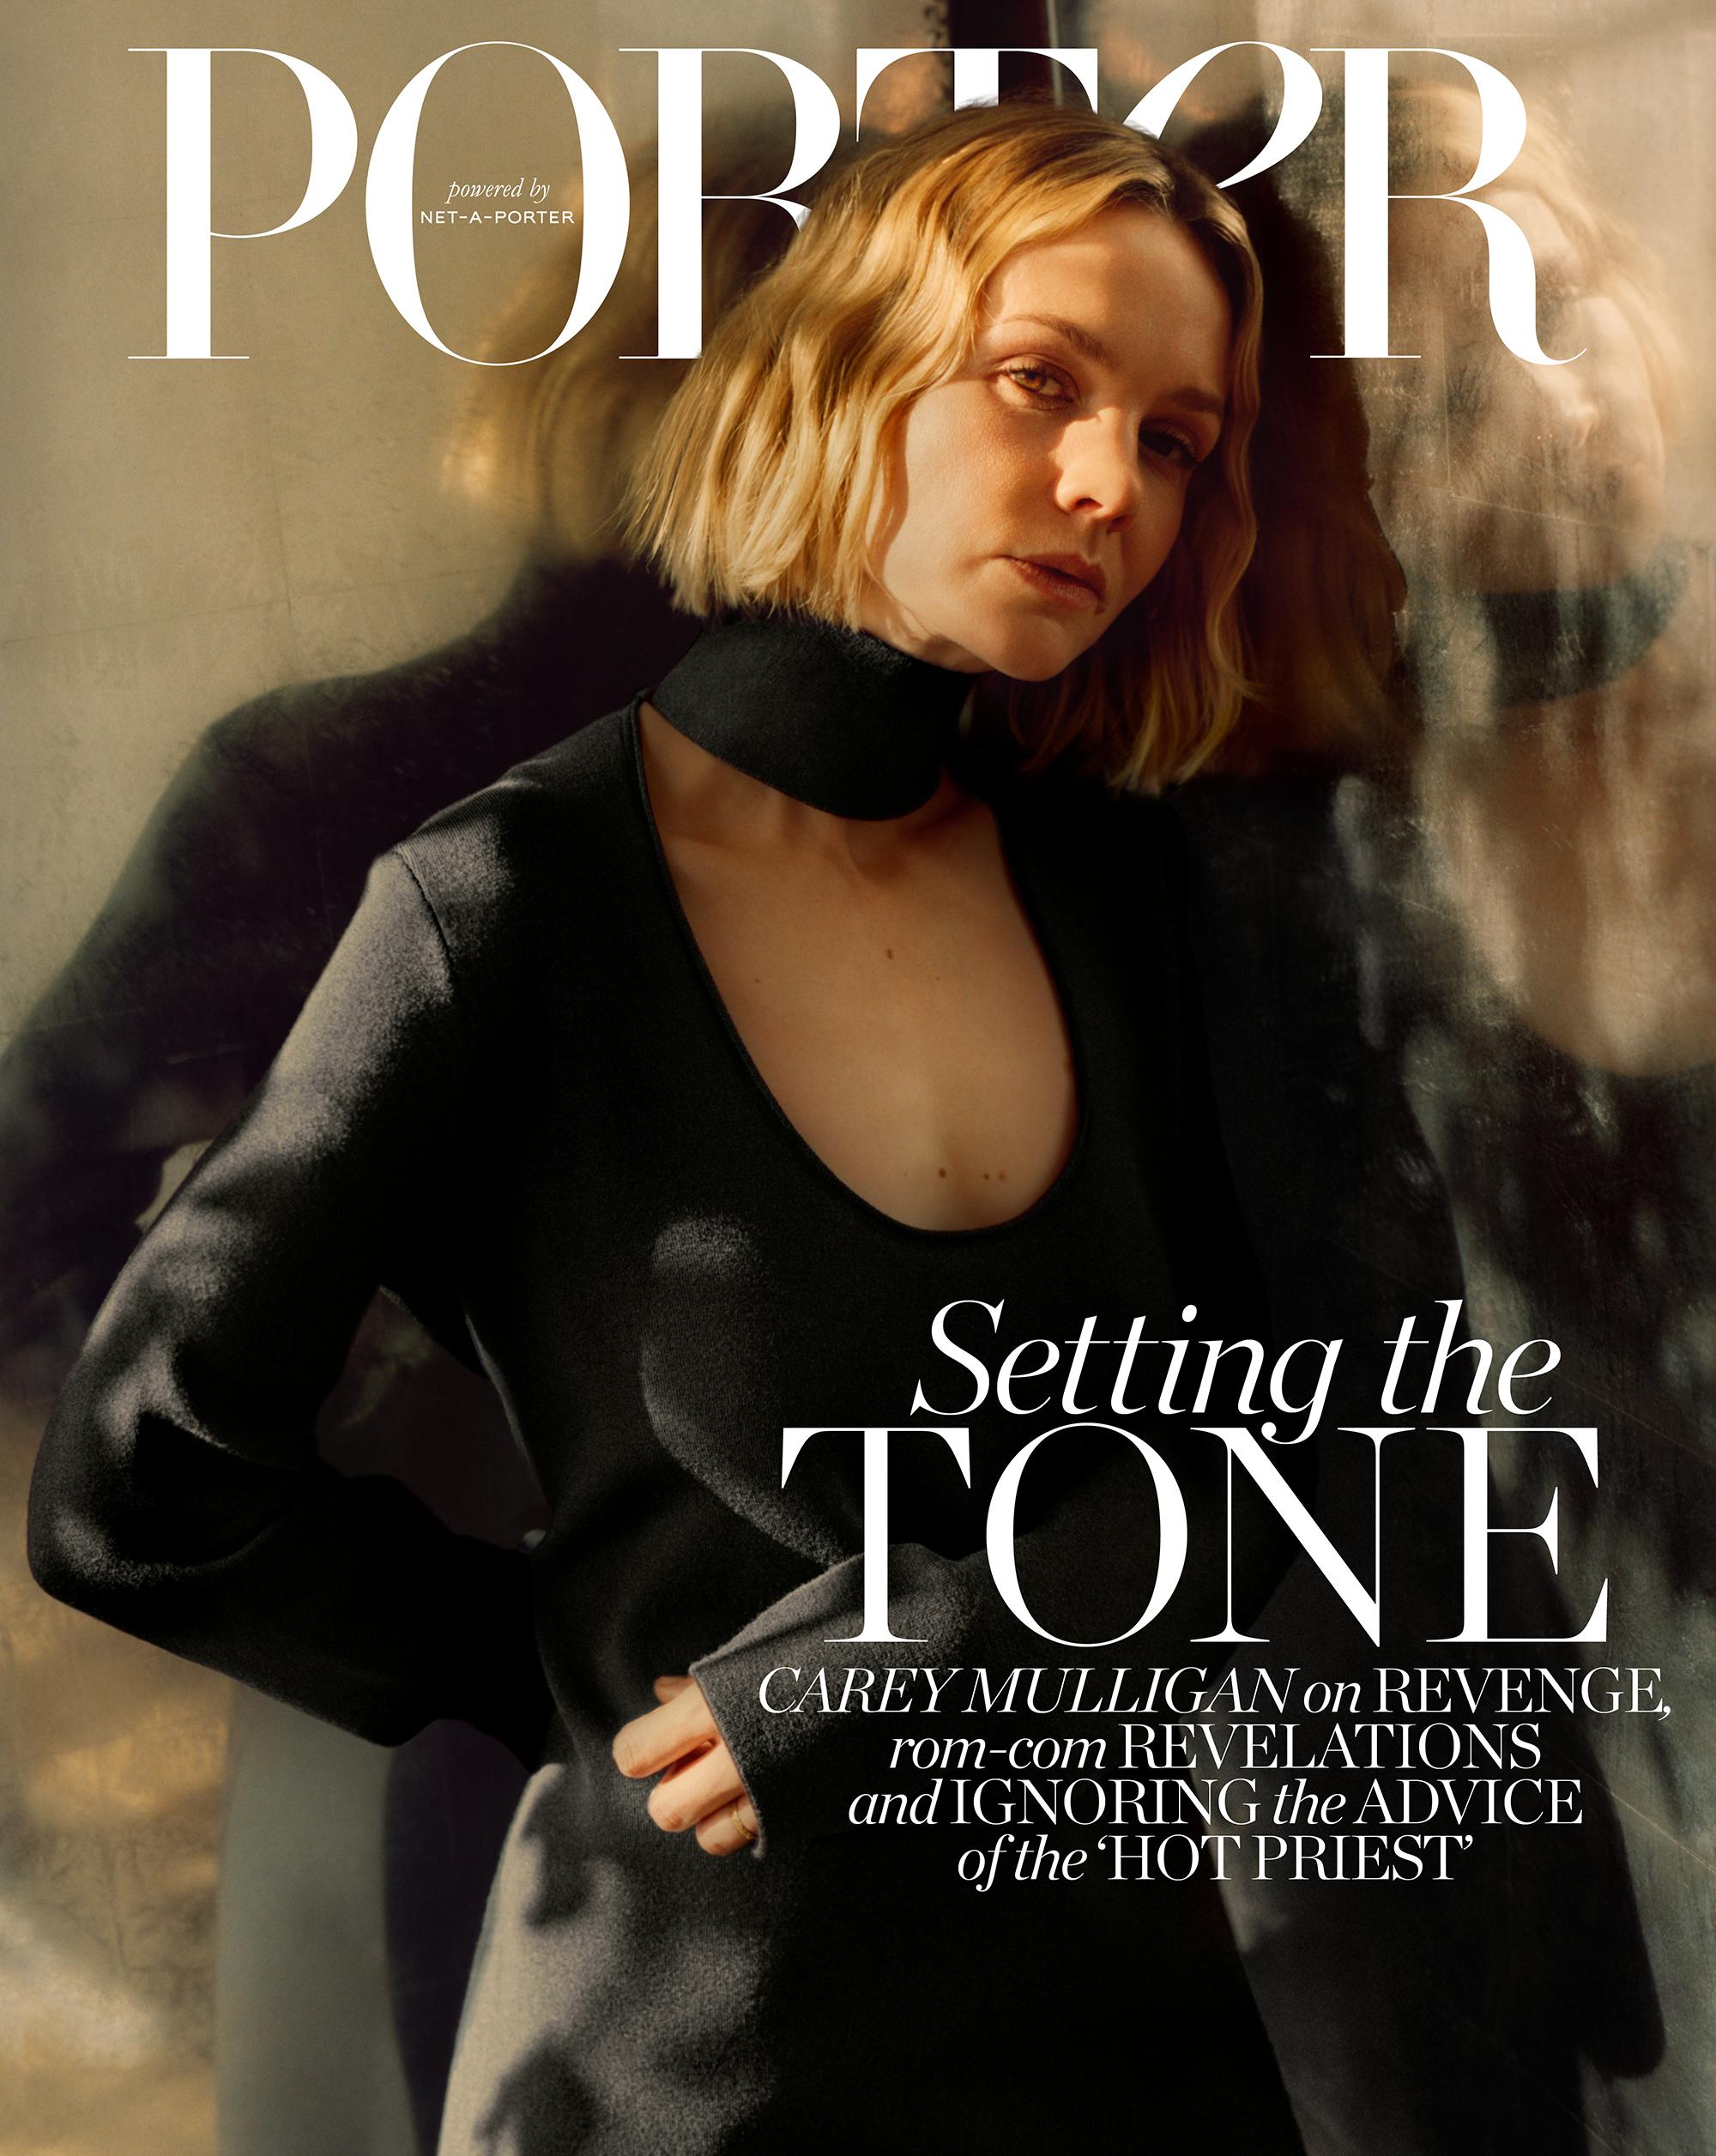 Carey Mulligan, Porter Magazine